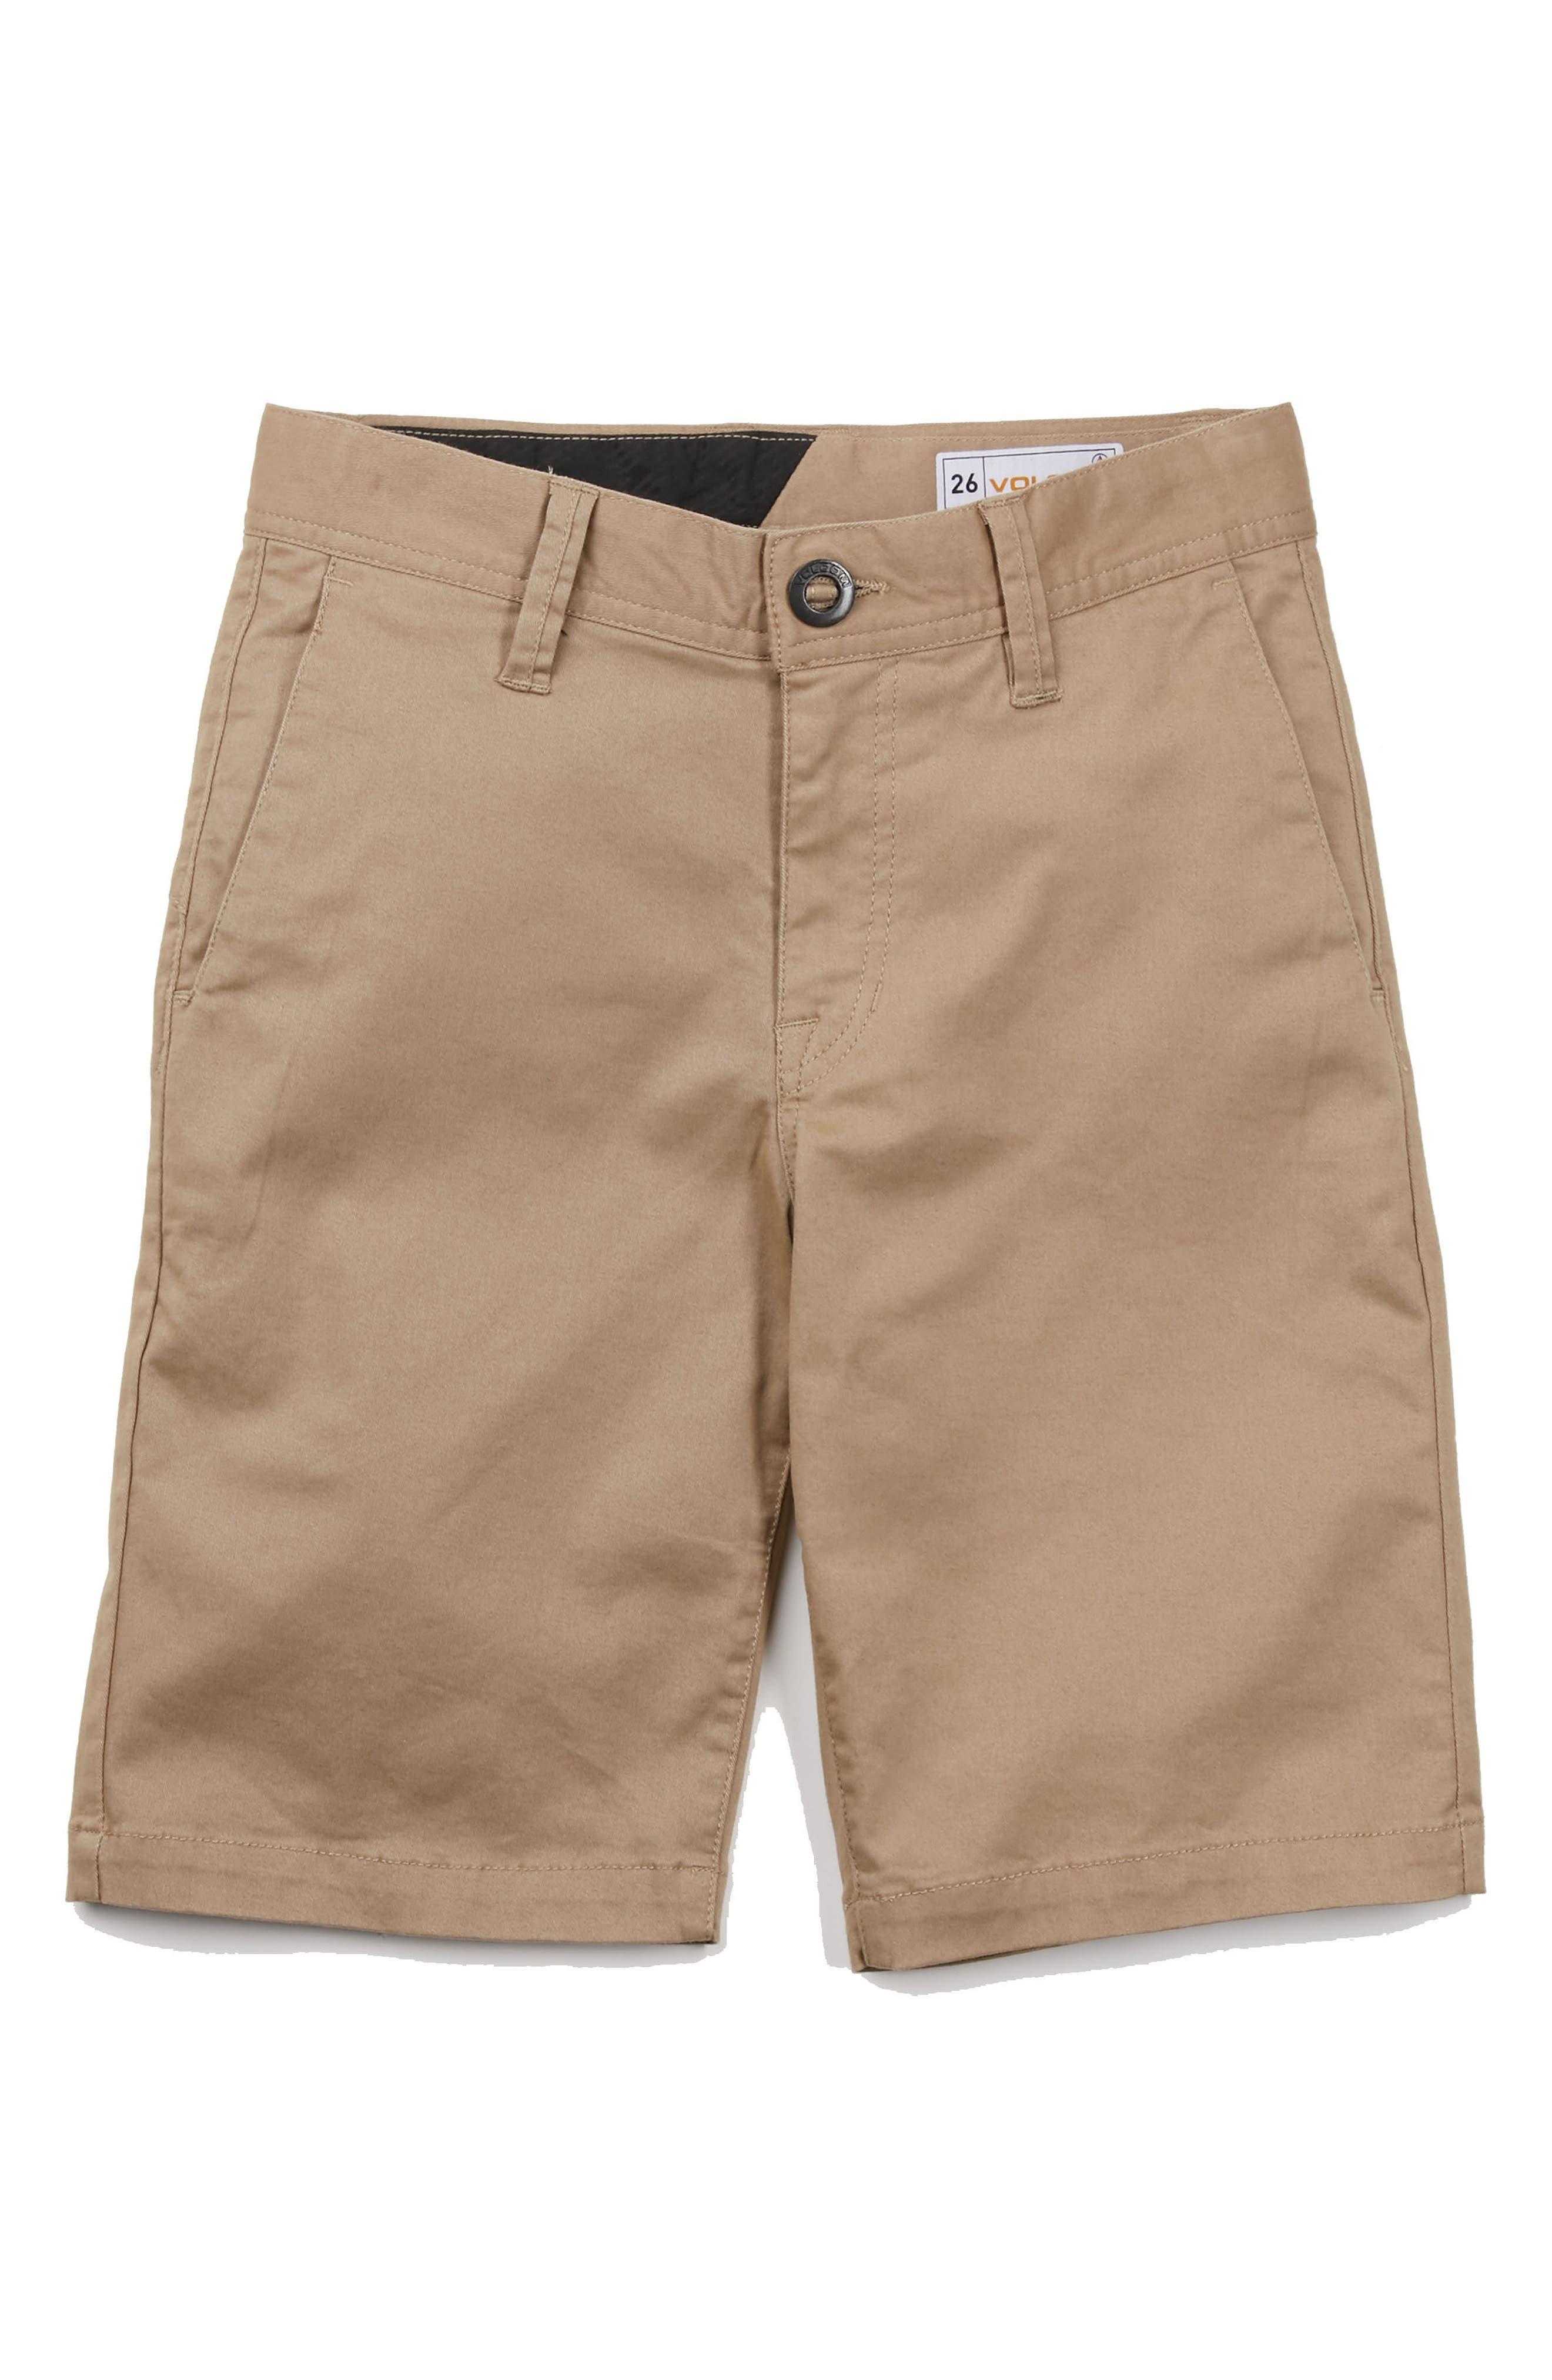 Cotton Twill Shorts,                             Main thumbnail 1, color,                             254